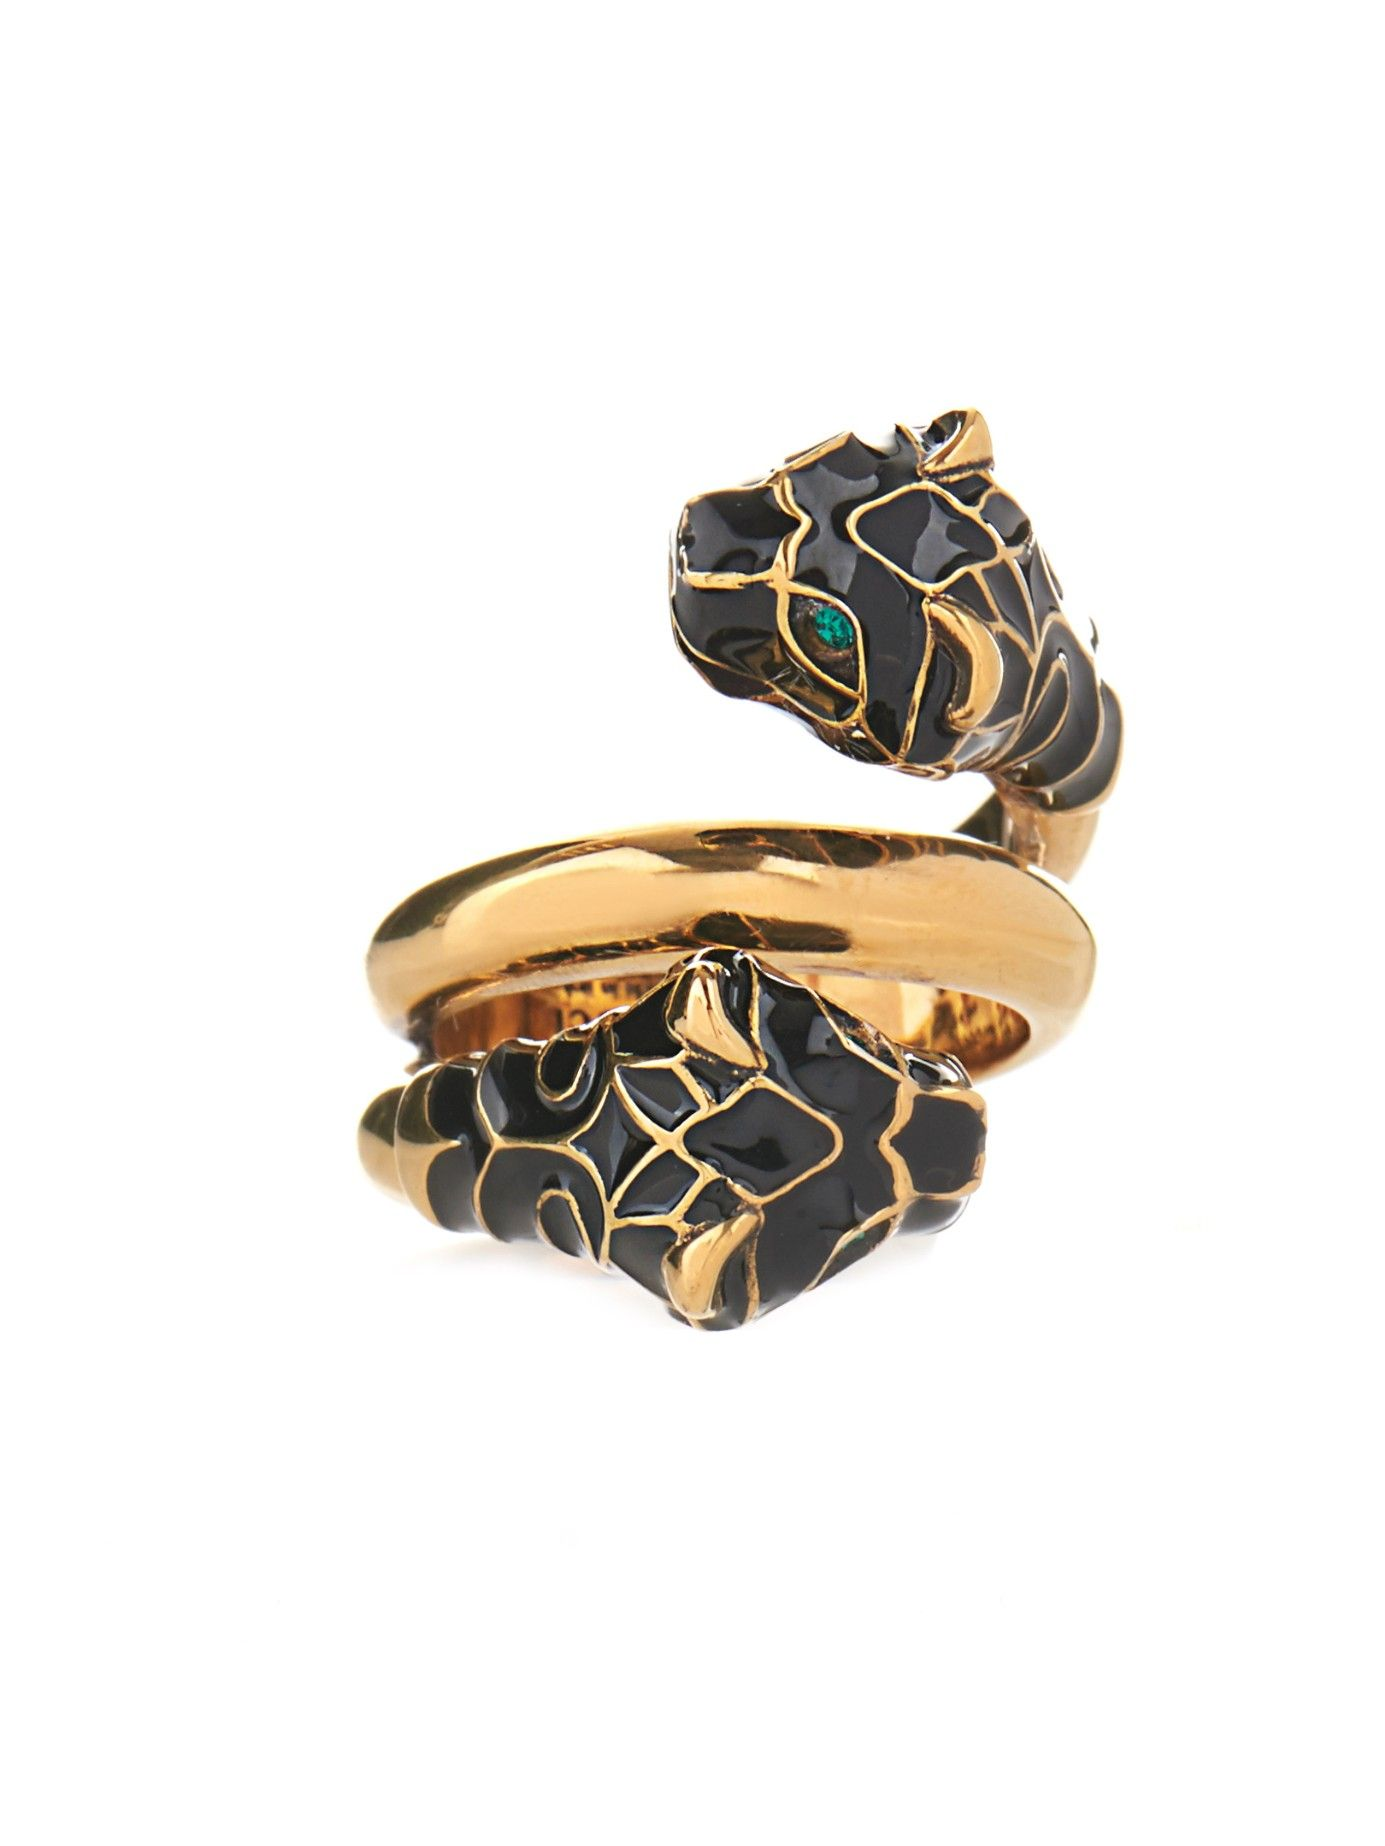 48a780976 Tiger Swarovski crystal ring | Gucci | MATCHESFASHION.COM ...